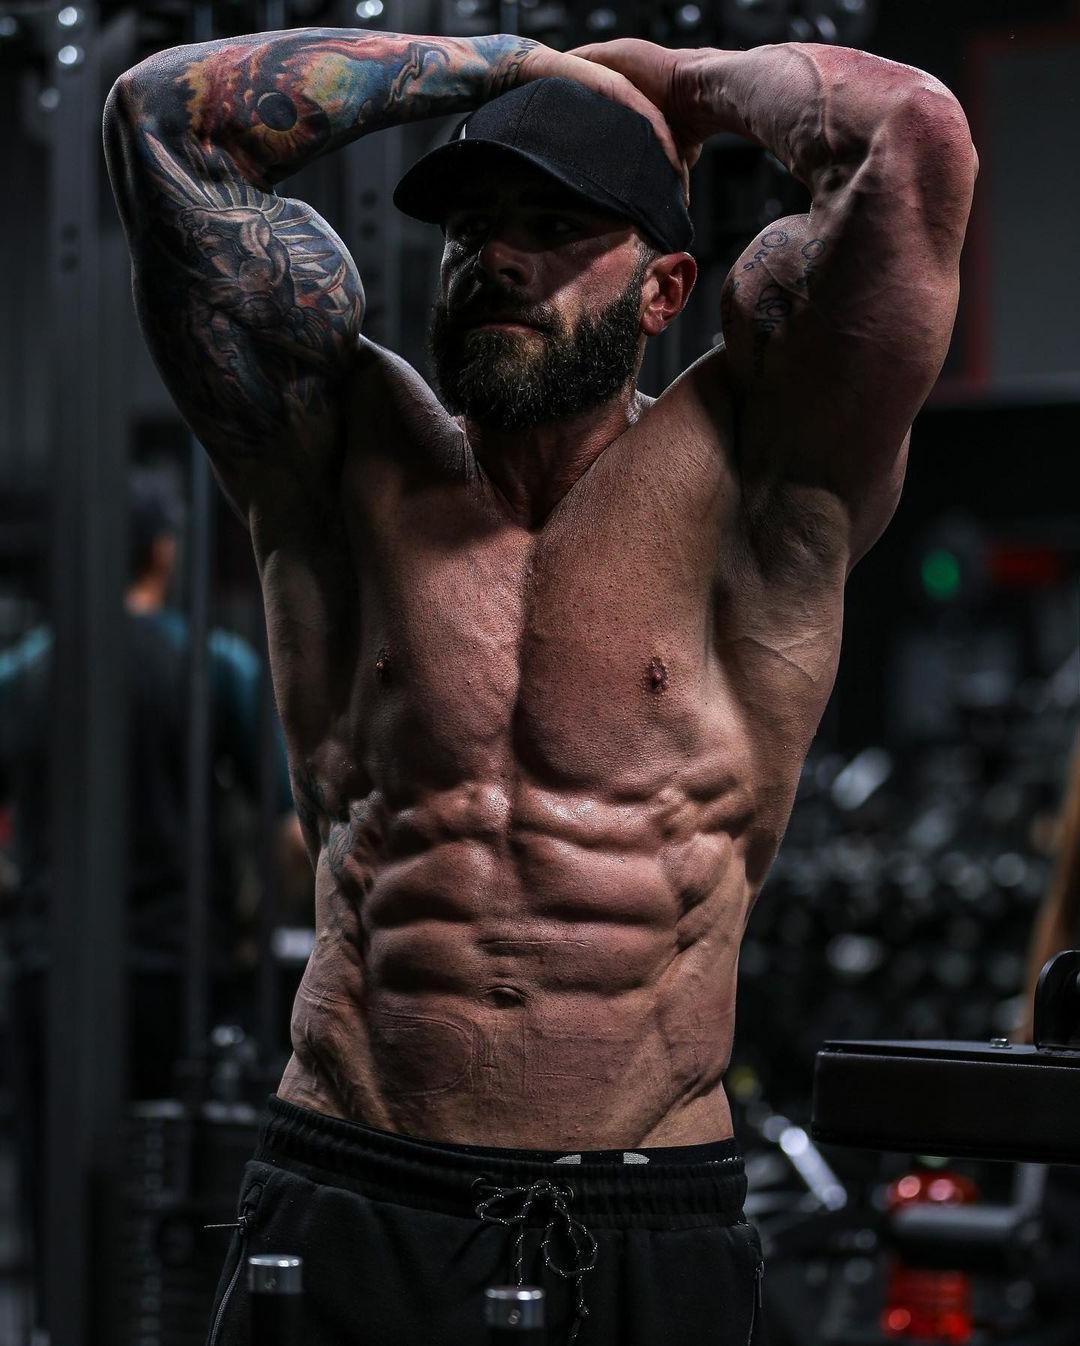 bearded-dilf-parker-egerton-abs-flex-bearded-sexy-daddy-gym-hunk